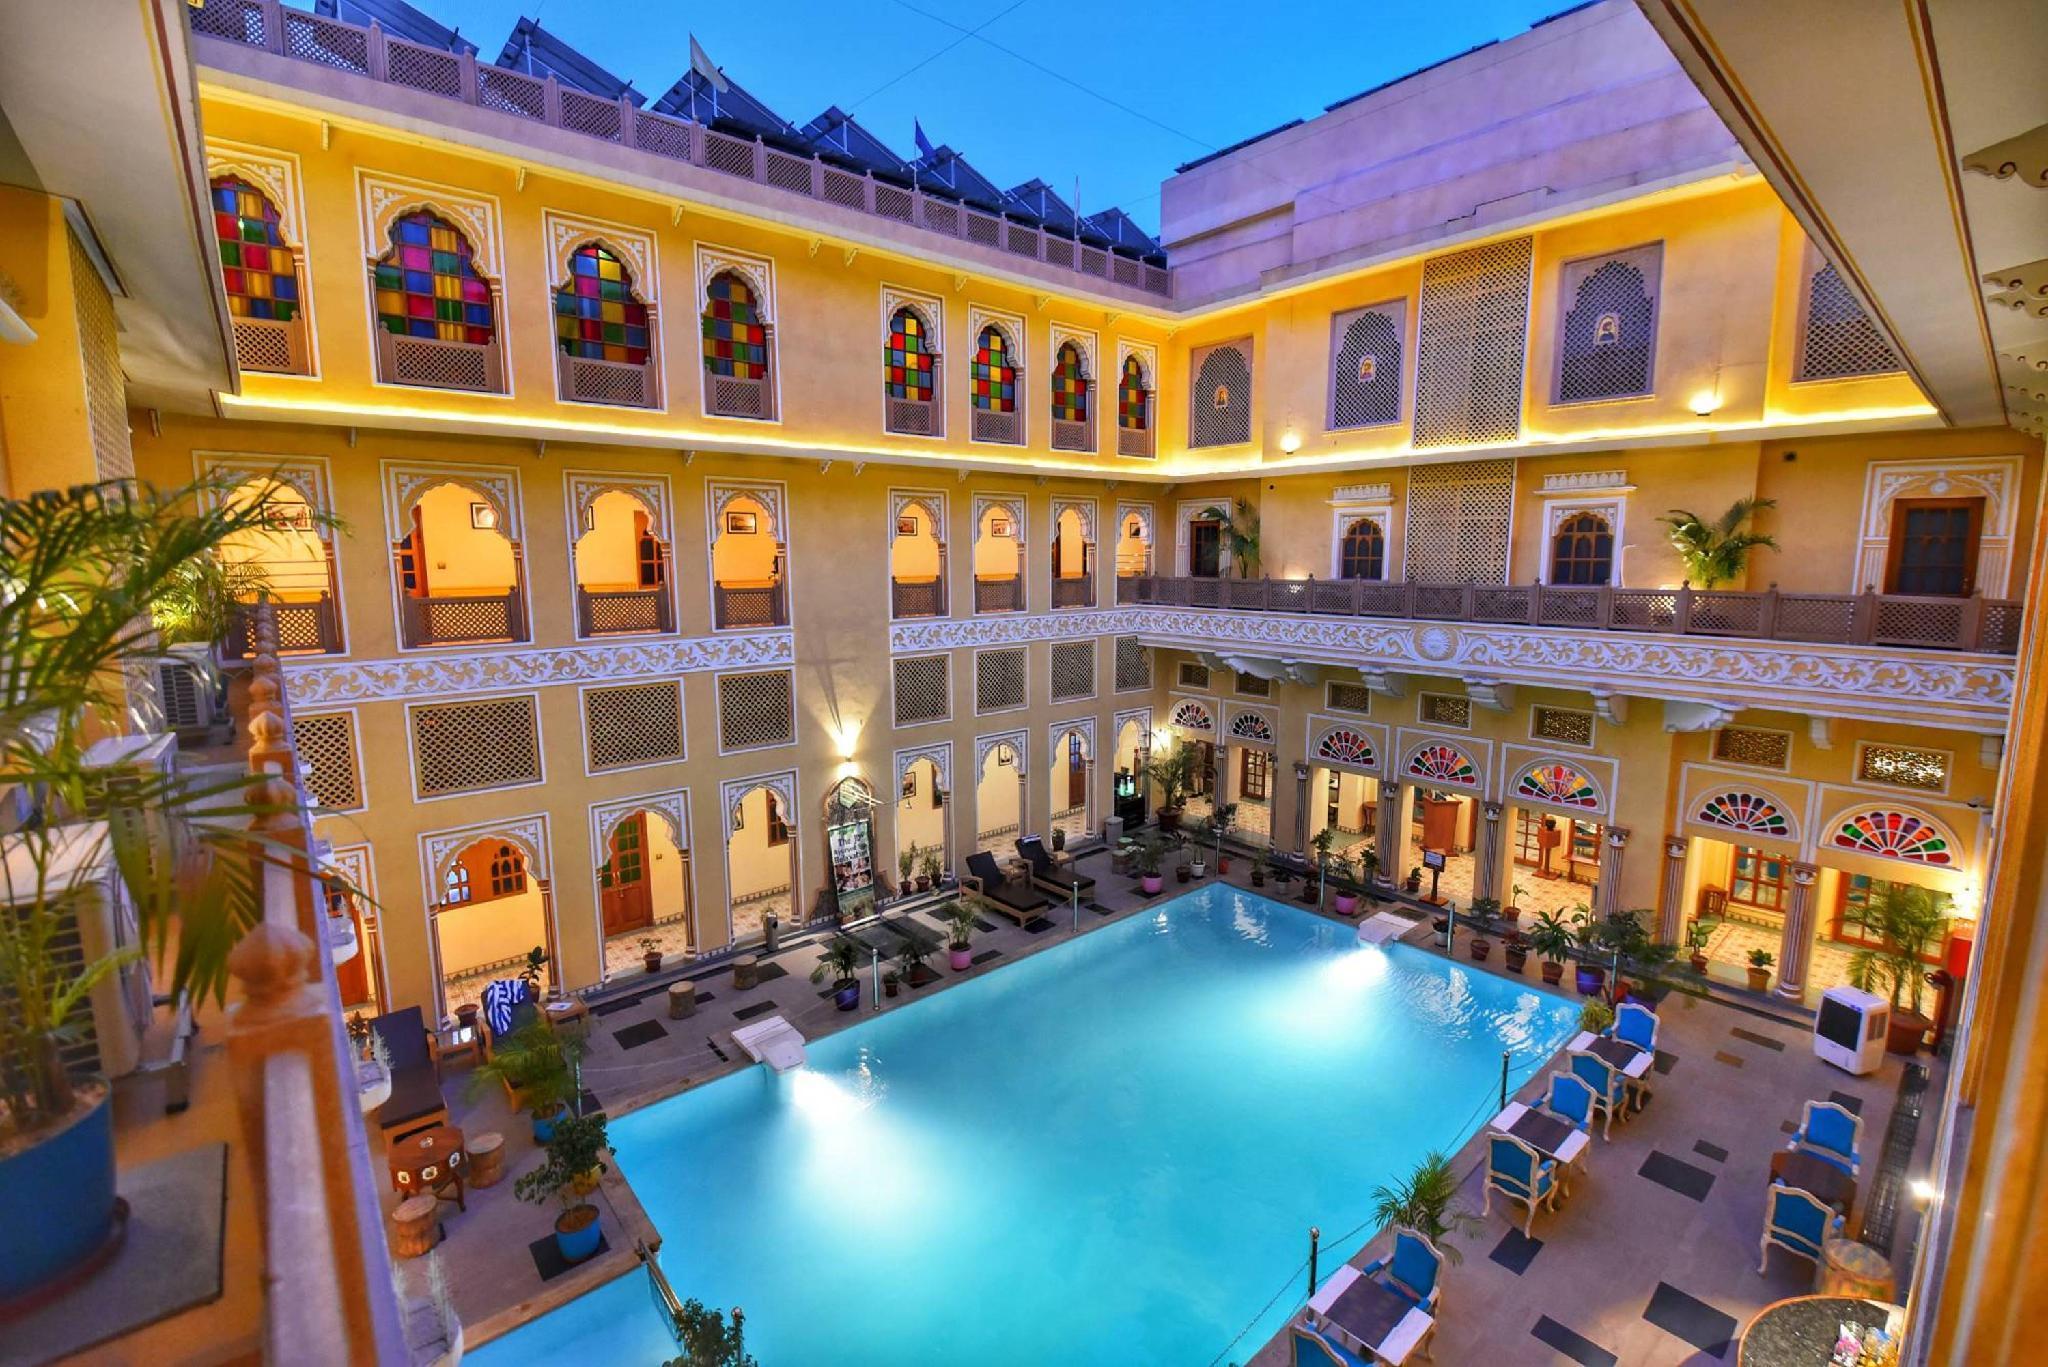 Nirbana Palace A Heritage Hotel And Spa